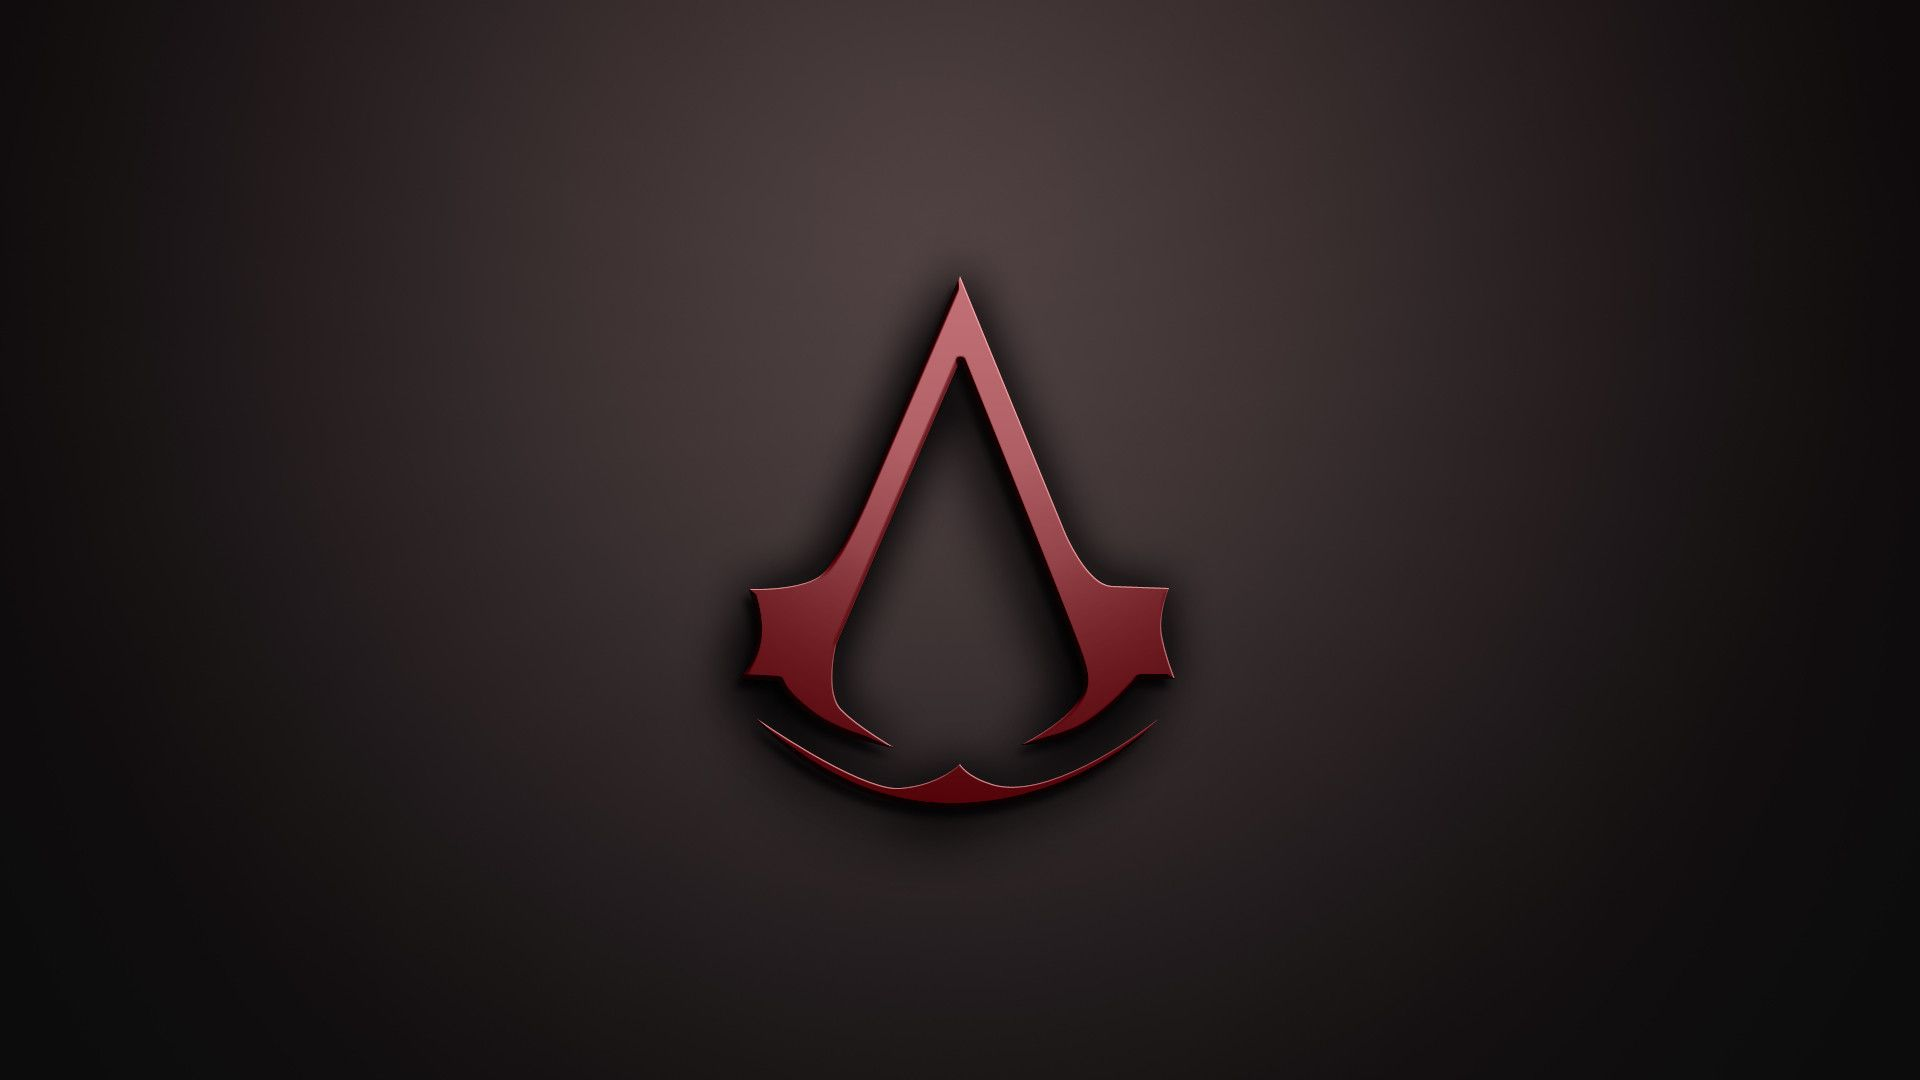 Assassin Symbol Wallpapers Top Free Assassin Symbol Backgrounds Wallpaperaccess